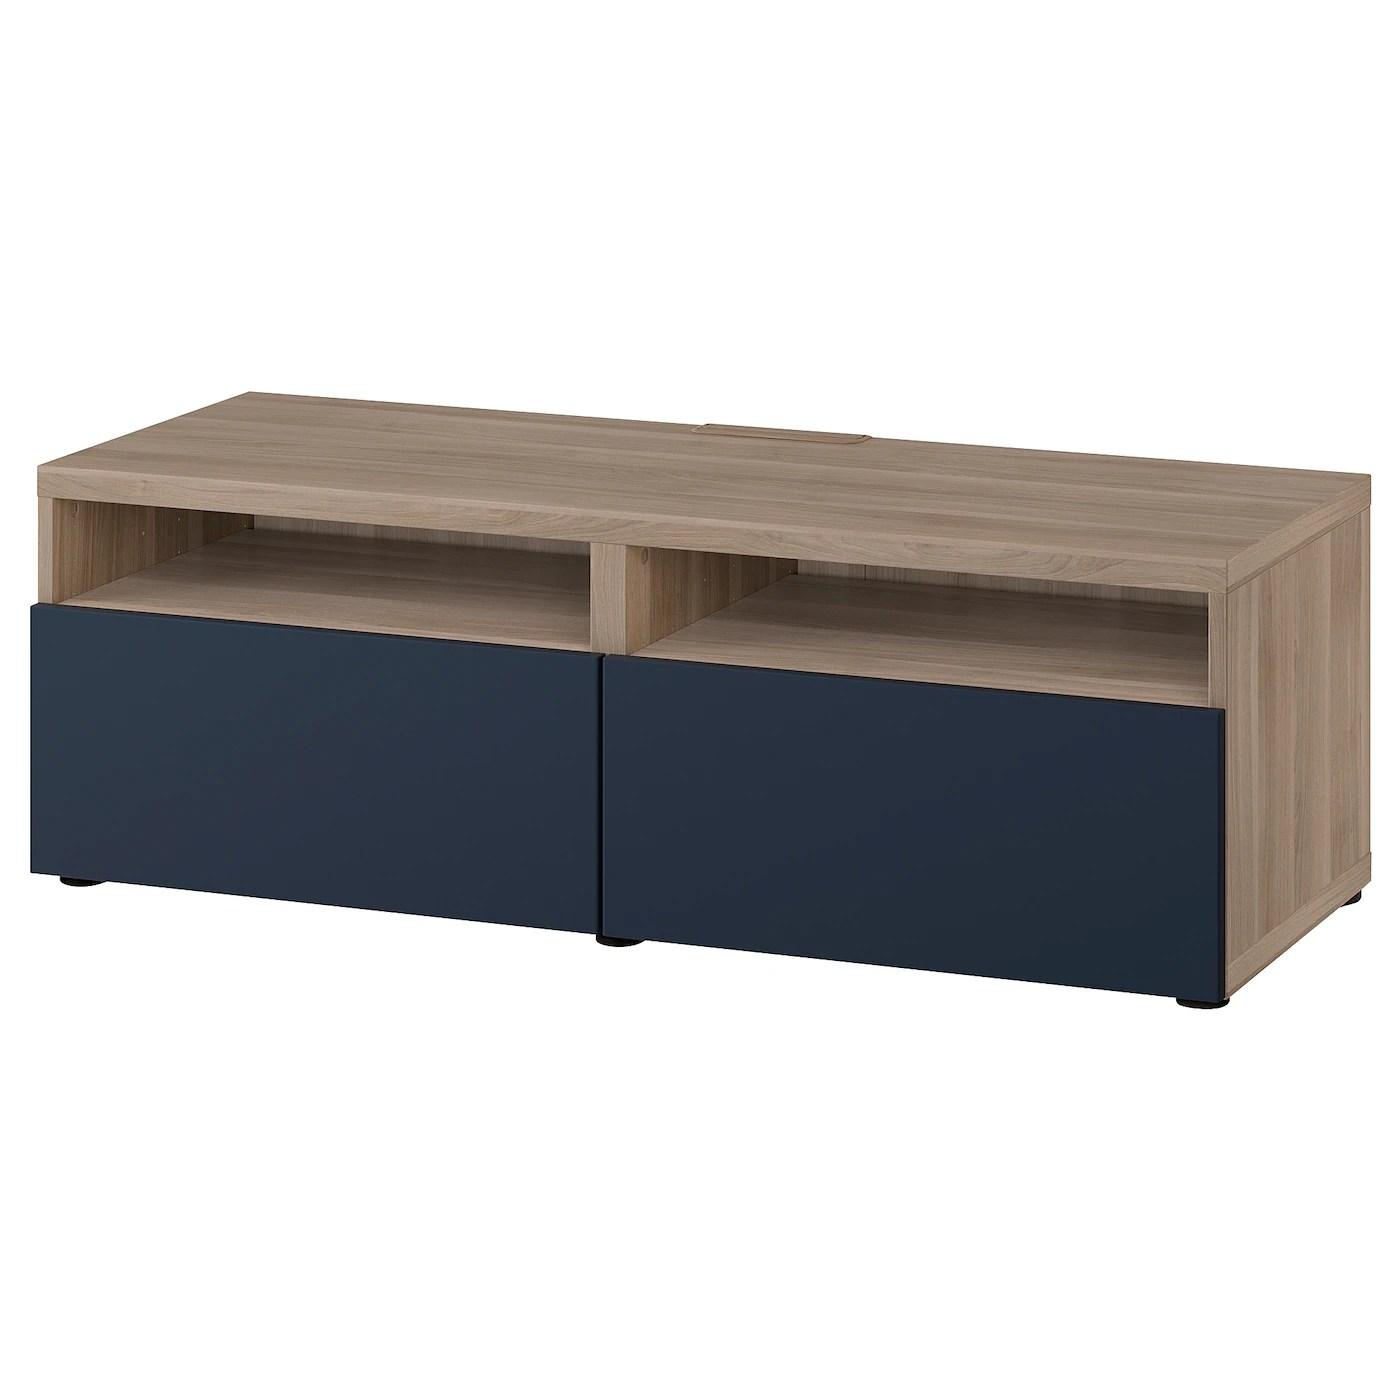 besta tv bench with drawers grey stained walnut effect notviken blue 120x42x39 cm